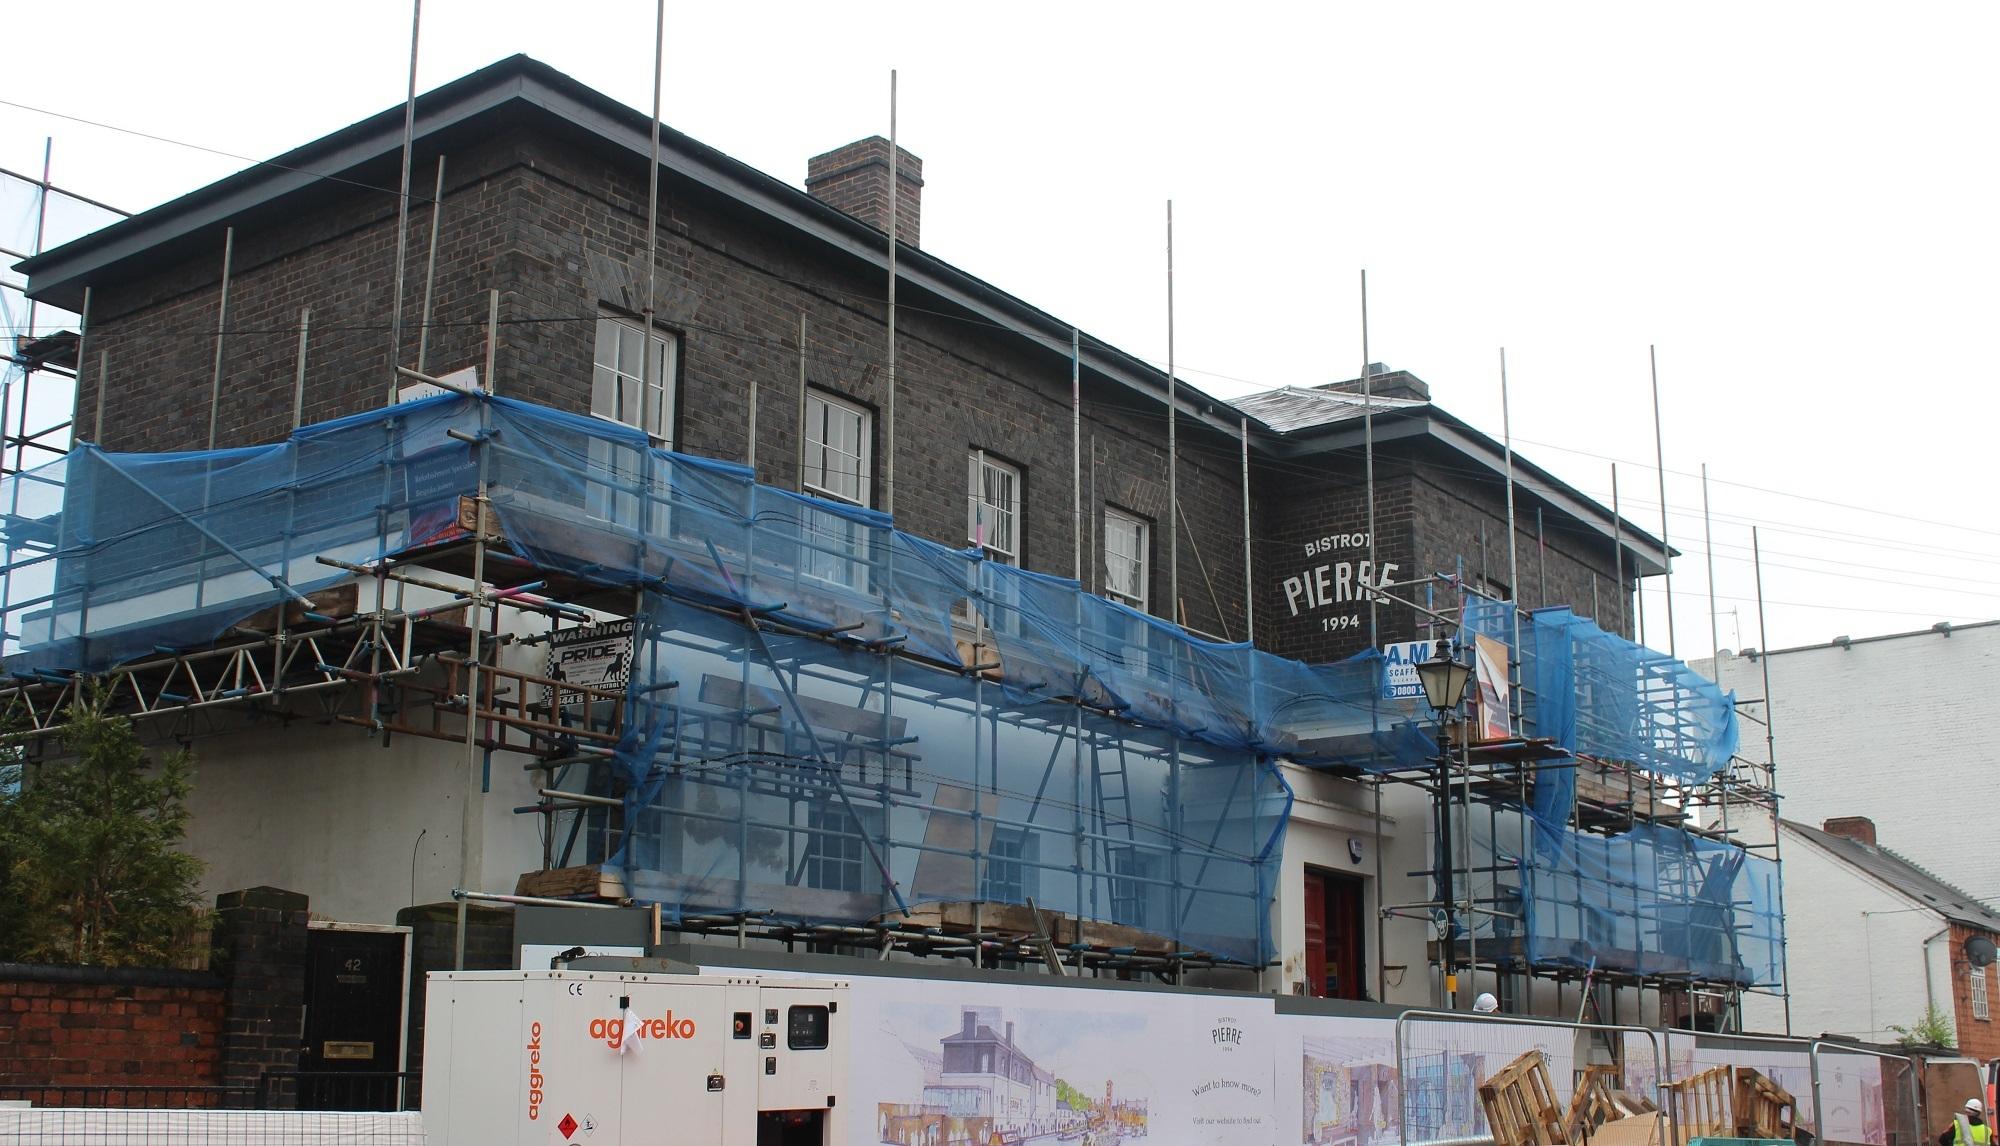 Bistrot Pierre set to transform Birmingham's historic Canal Building